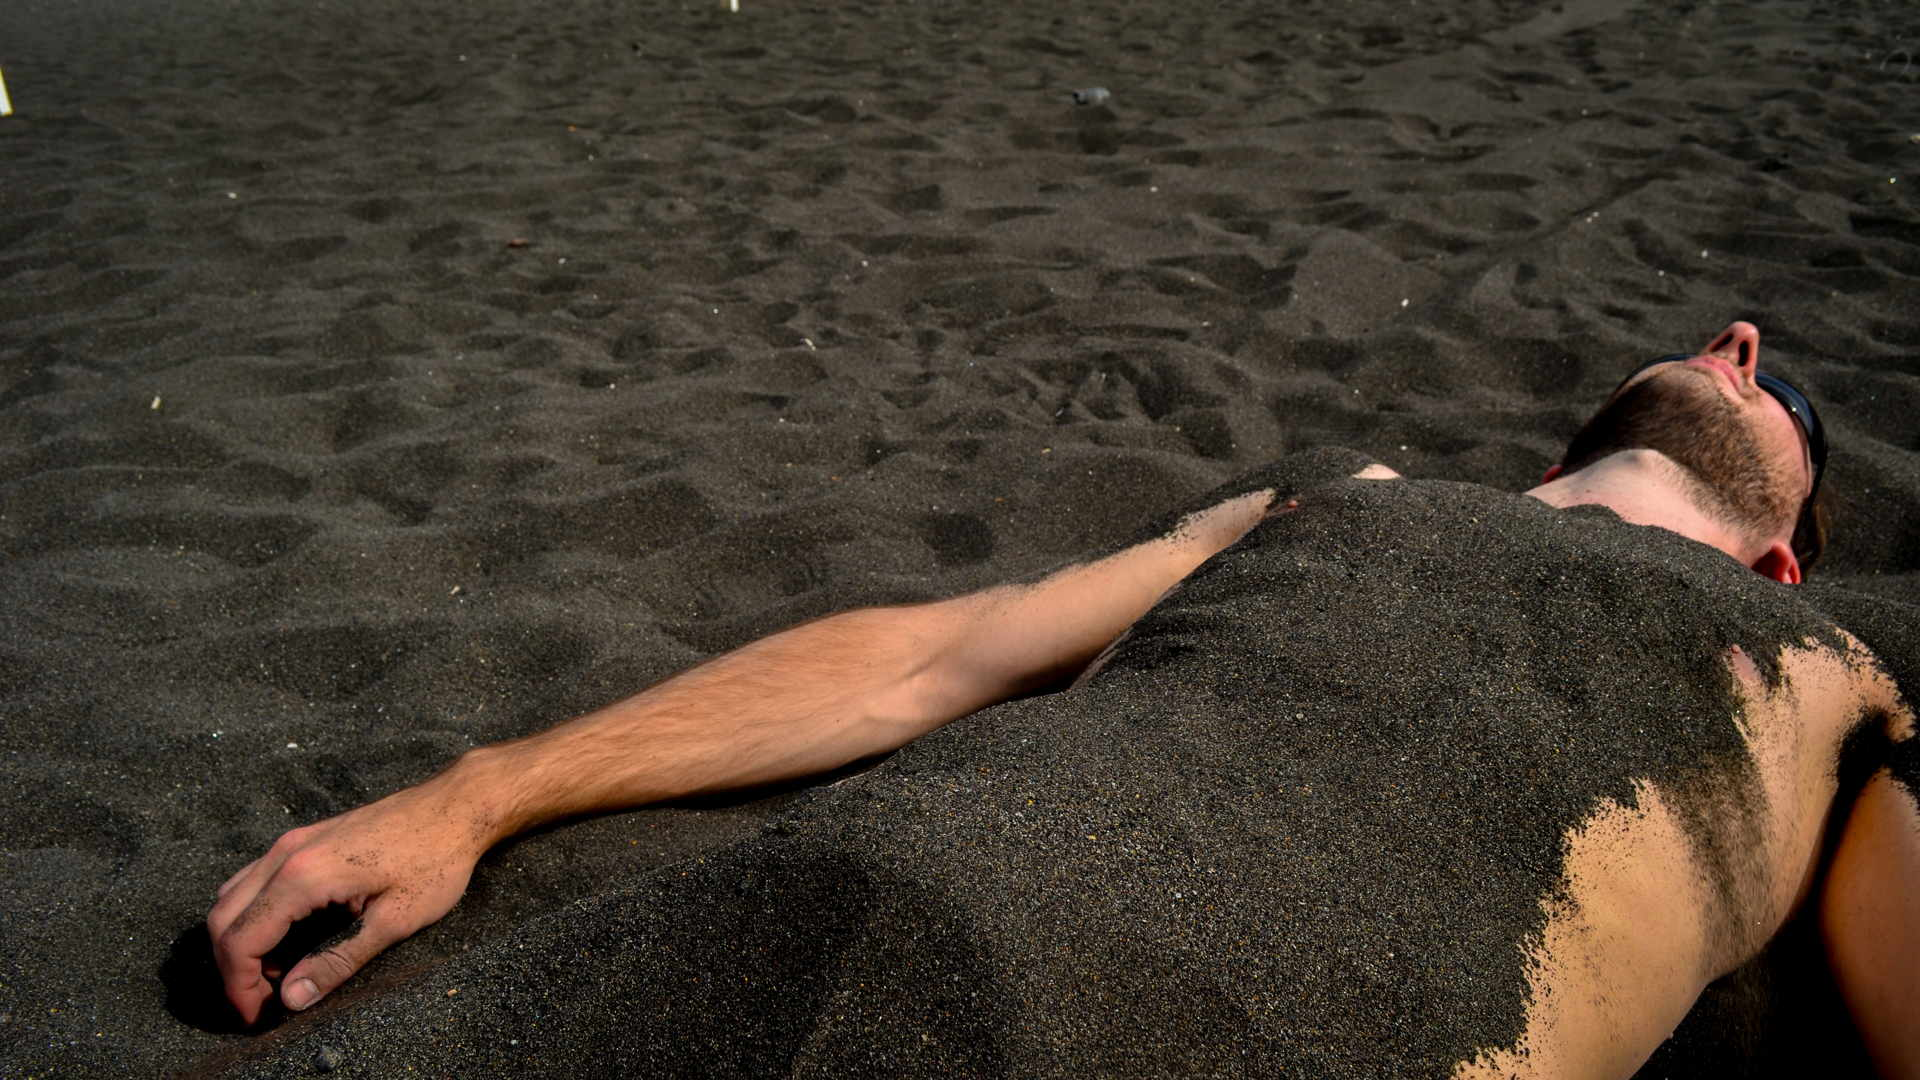 Aeolian islands travel guide, black beach vulcano, black sand beach, beaches of vulcano, travel blog vulcano, Sabbie Nere beach